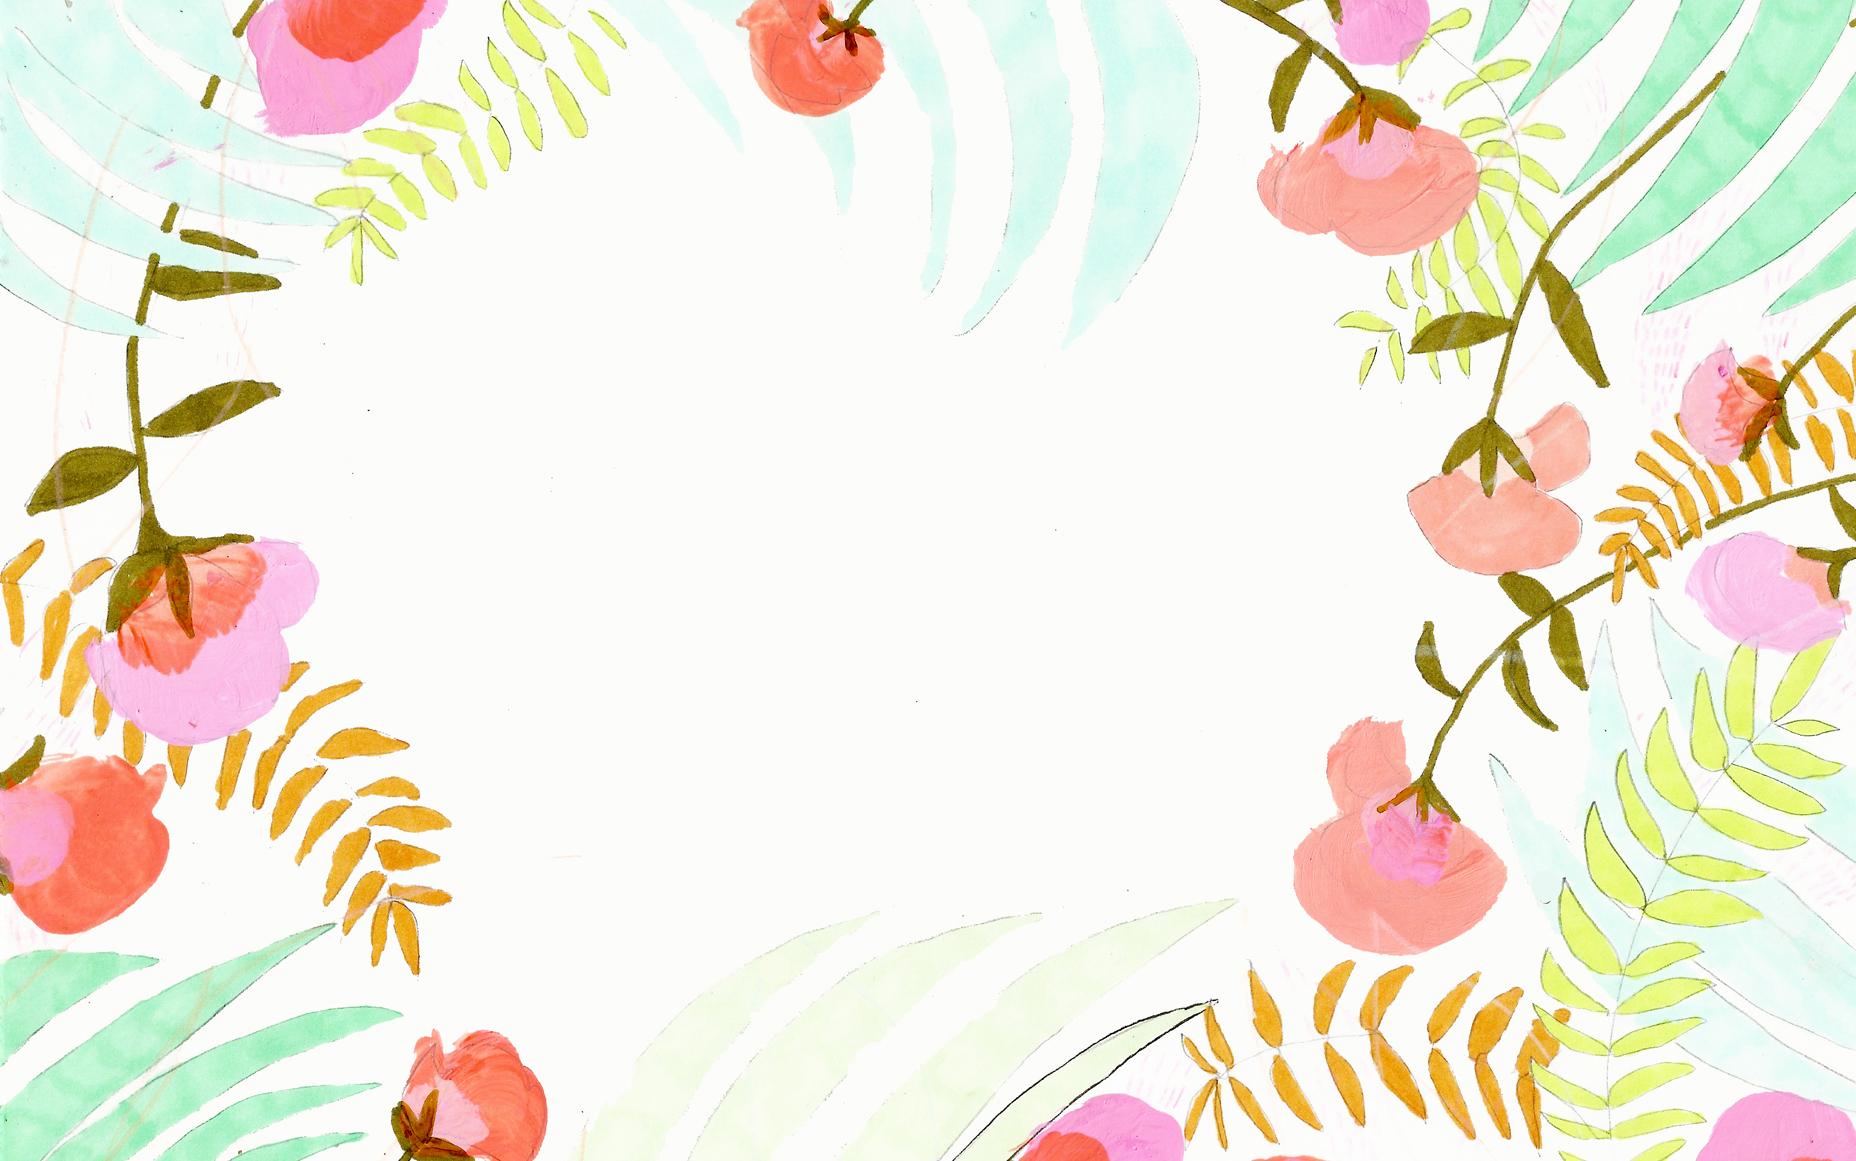 painted flower background felt